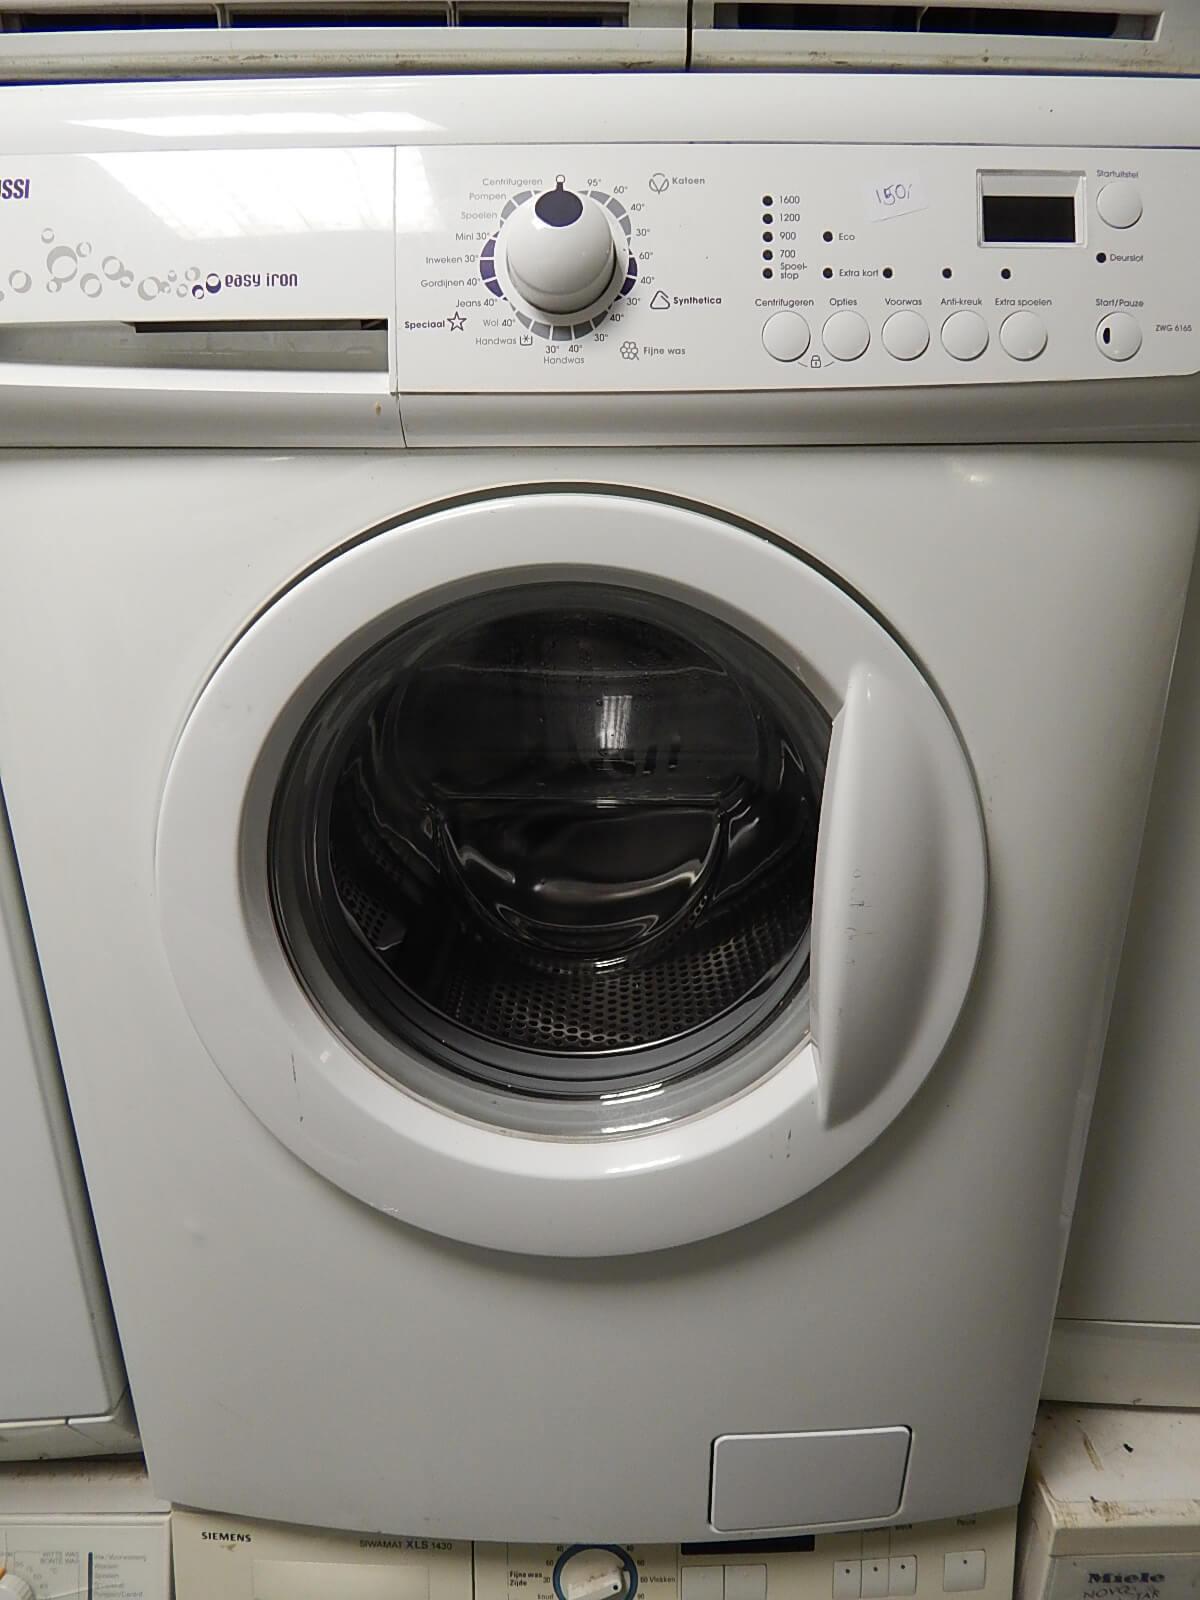 Zanussi wasmachine met uitgestelde start 1